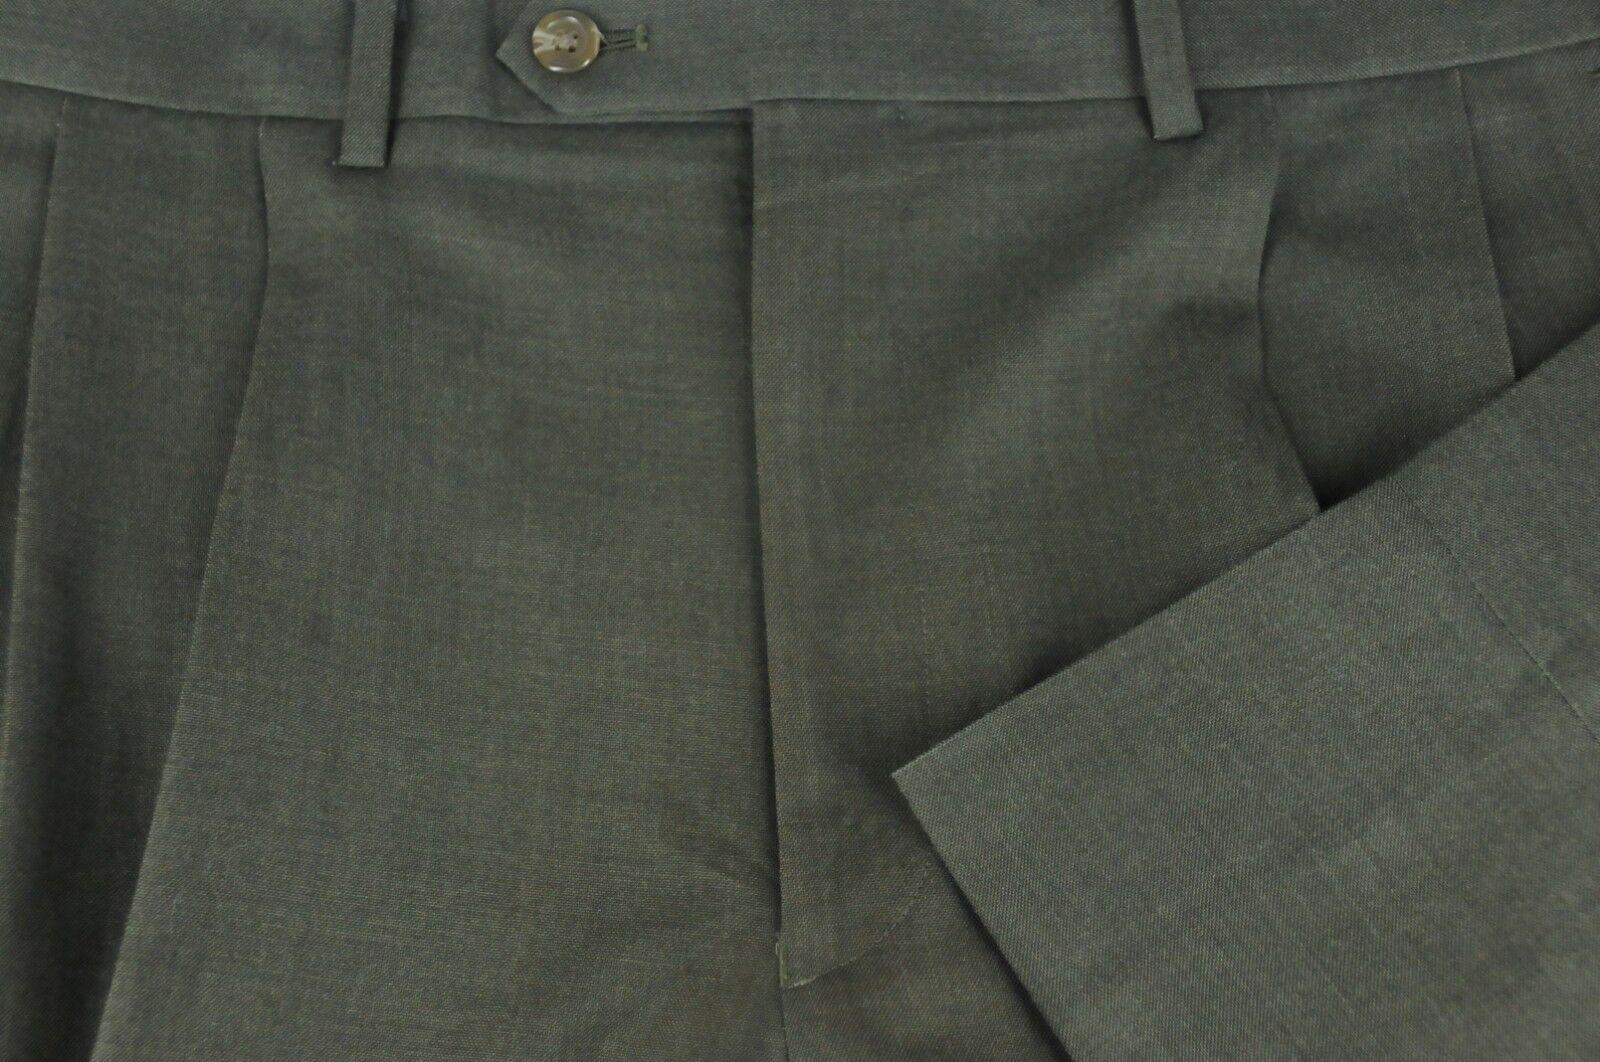 Ralph Ralph Lauren Men's Java Brown Gabardine Pleated Dress Pants 36 x 32